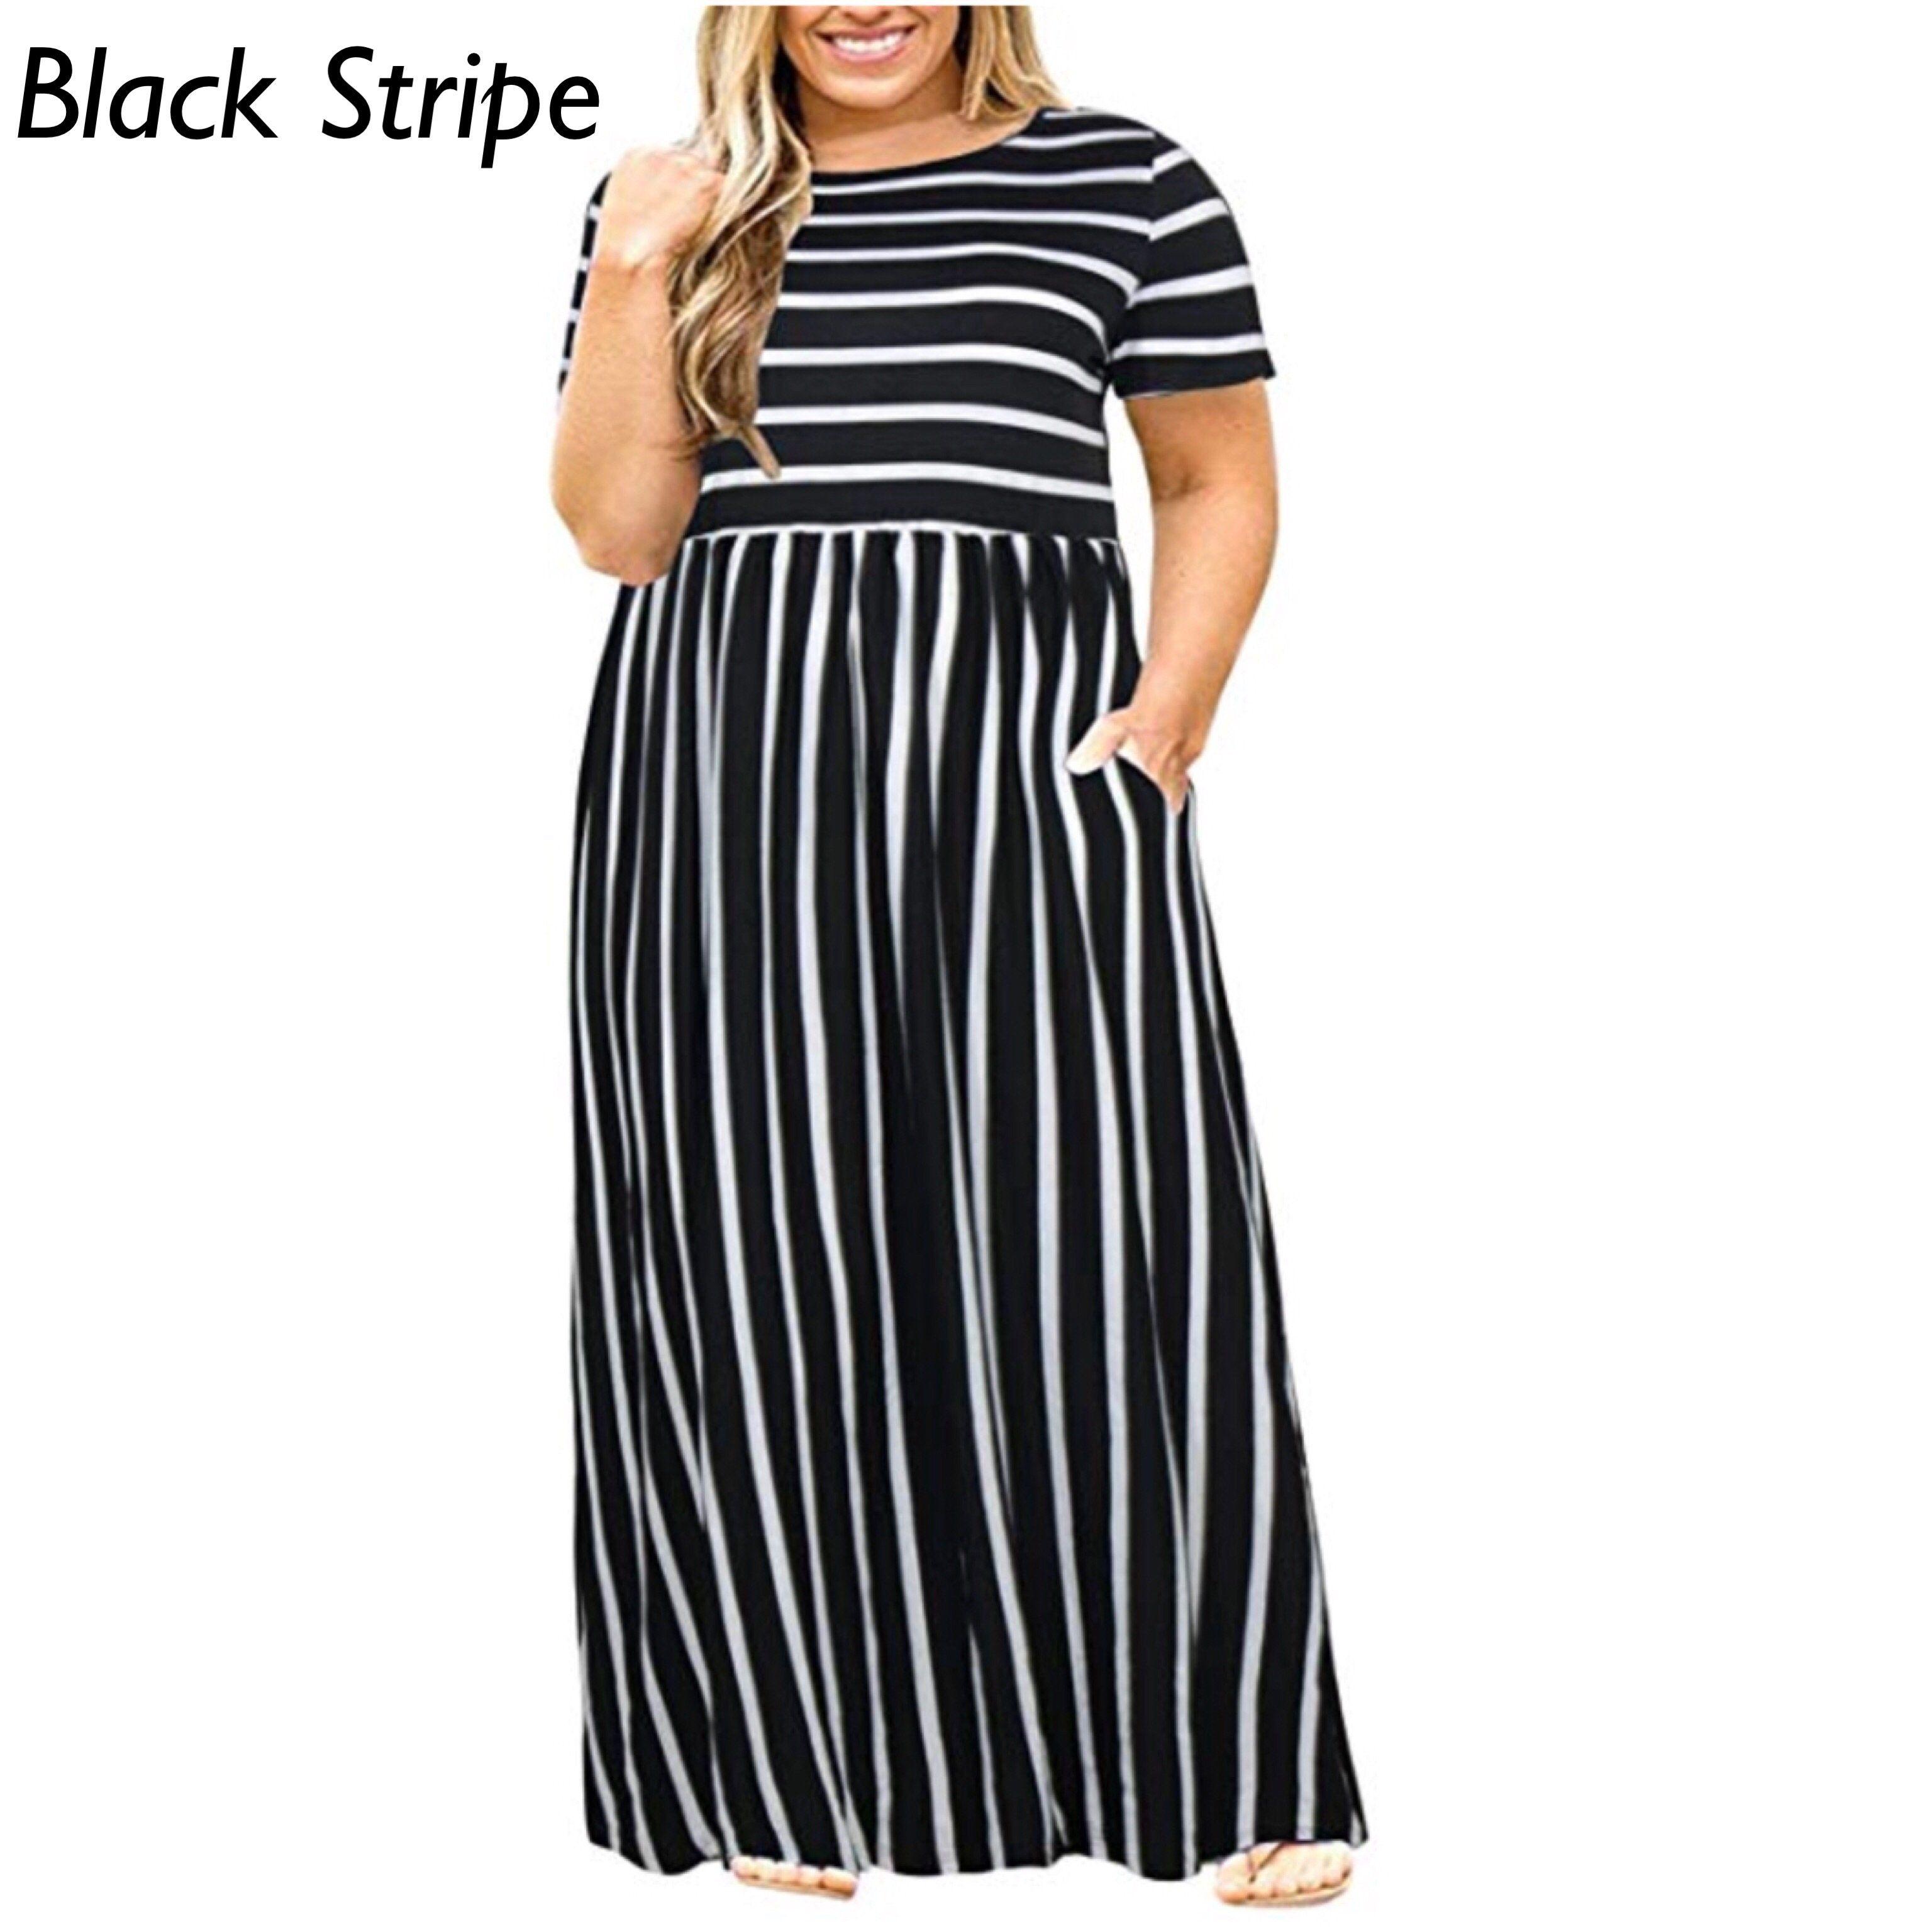 Casual Loose Plus Size Maxi Dress Us Sizes 14 Plus 26 Plus In 2021 Maxi Dress Vintage Maxi Dress Casual Dresses Plus Size [ 3072 x 3072 Pixel ]